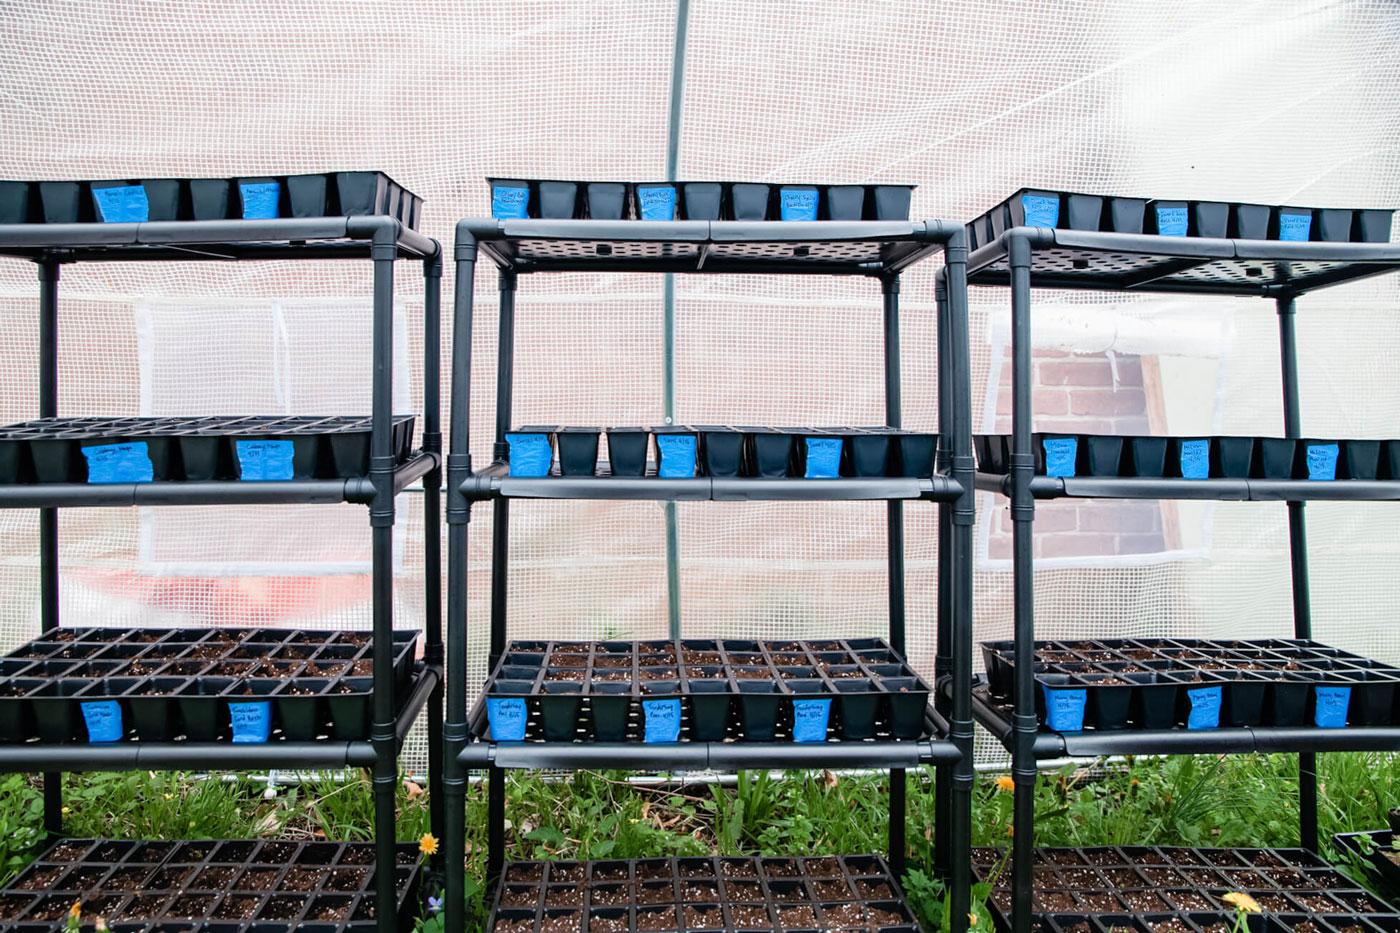 Black trays of nursery plants growing.